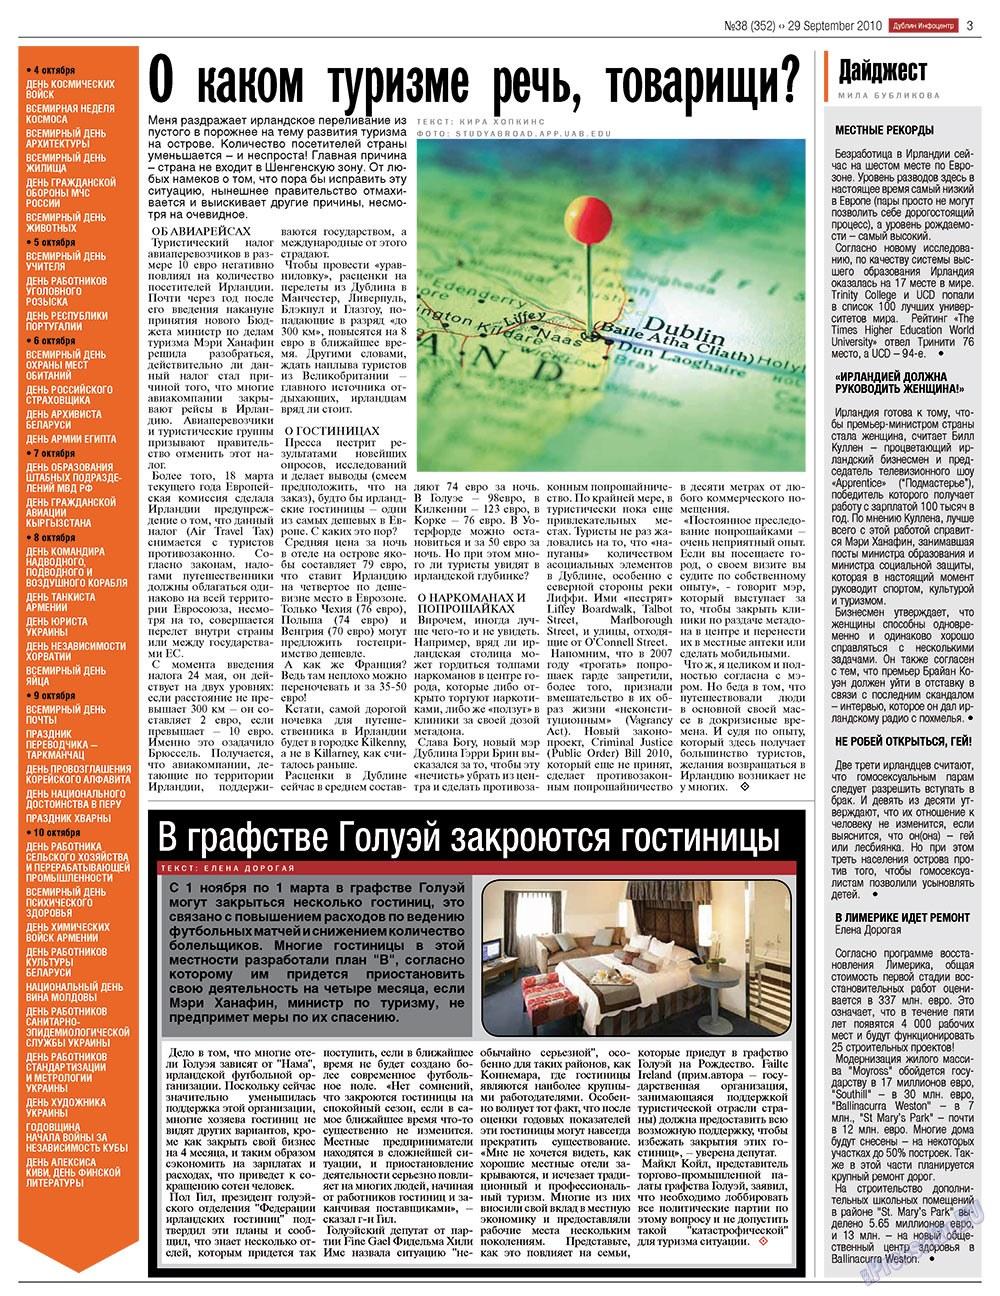 Дублин инфоцентр (газета). 2010 год, номер 38, стр. 3